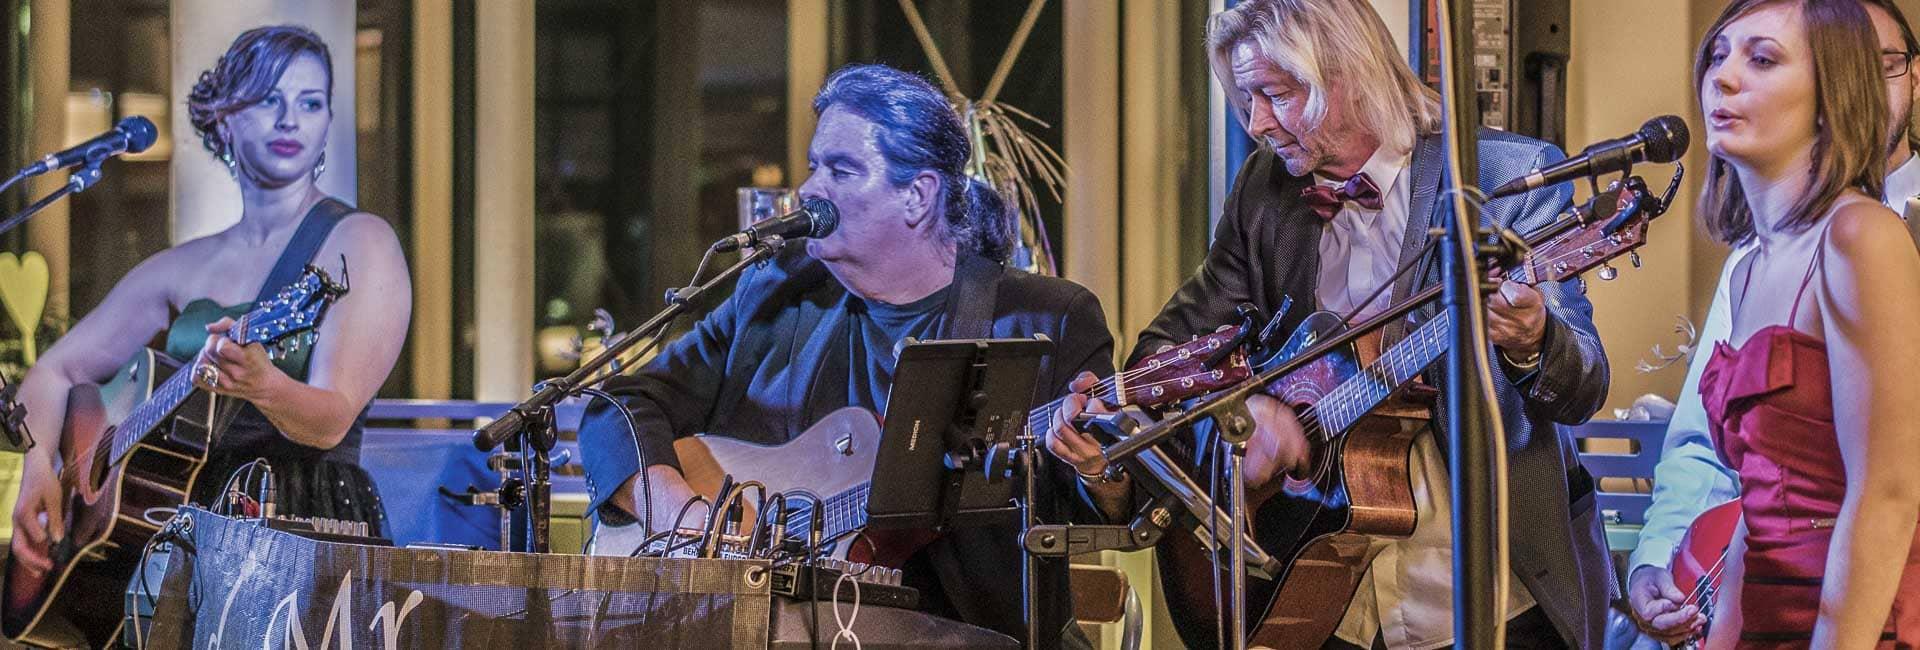 Live-Musik im Reiters Reserve